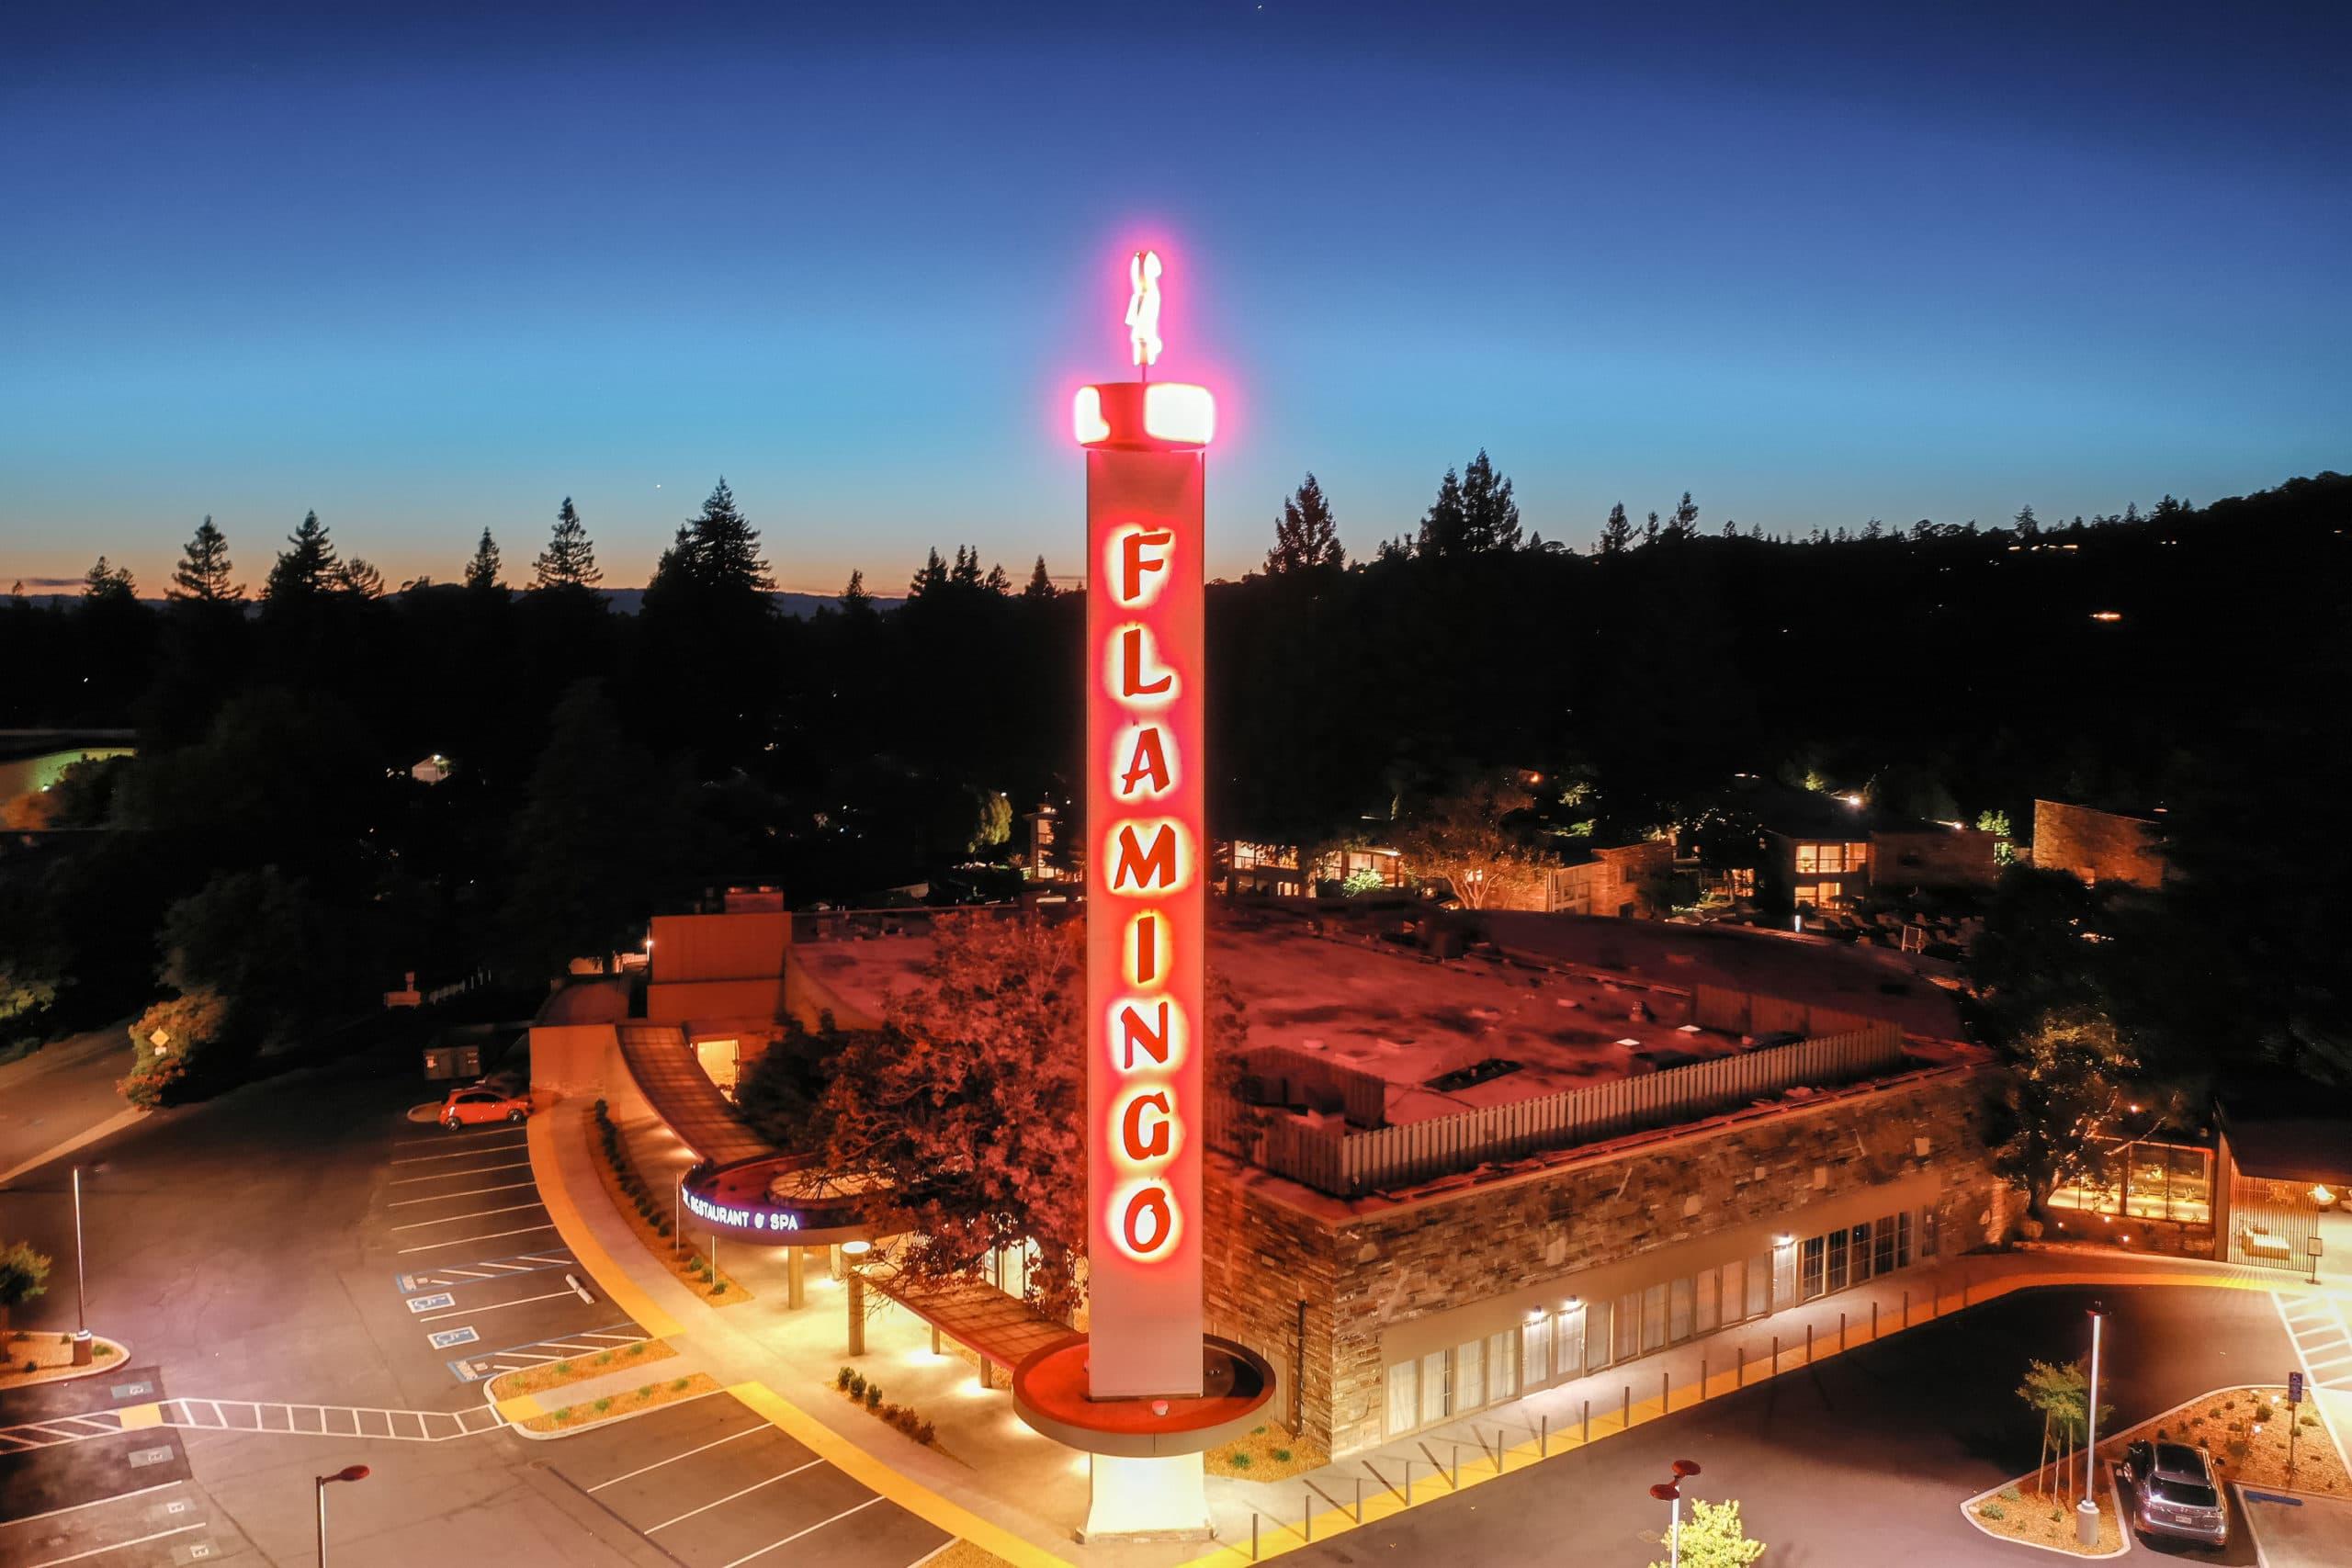 Retro Motels & Motor Lodges Across the United States